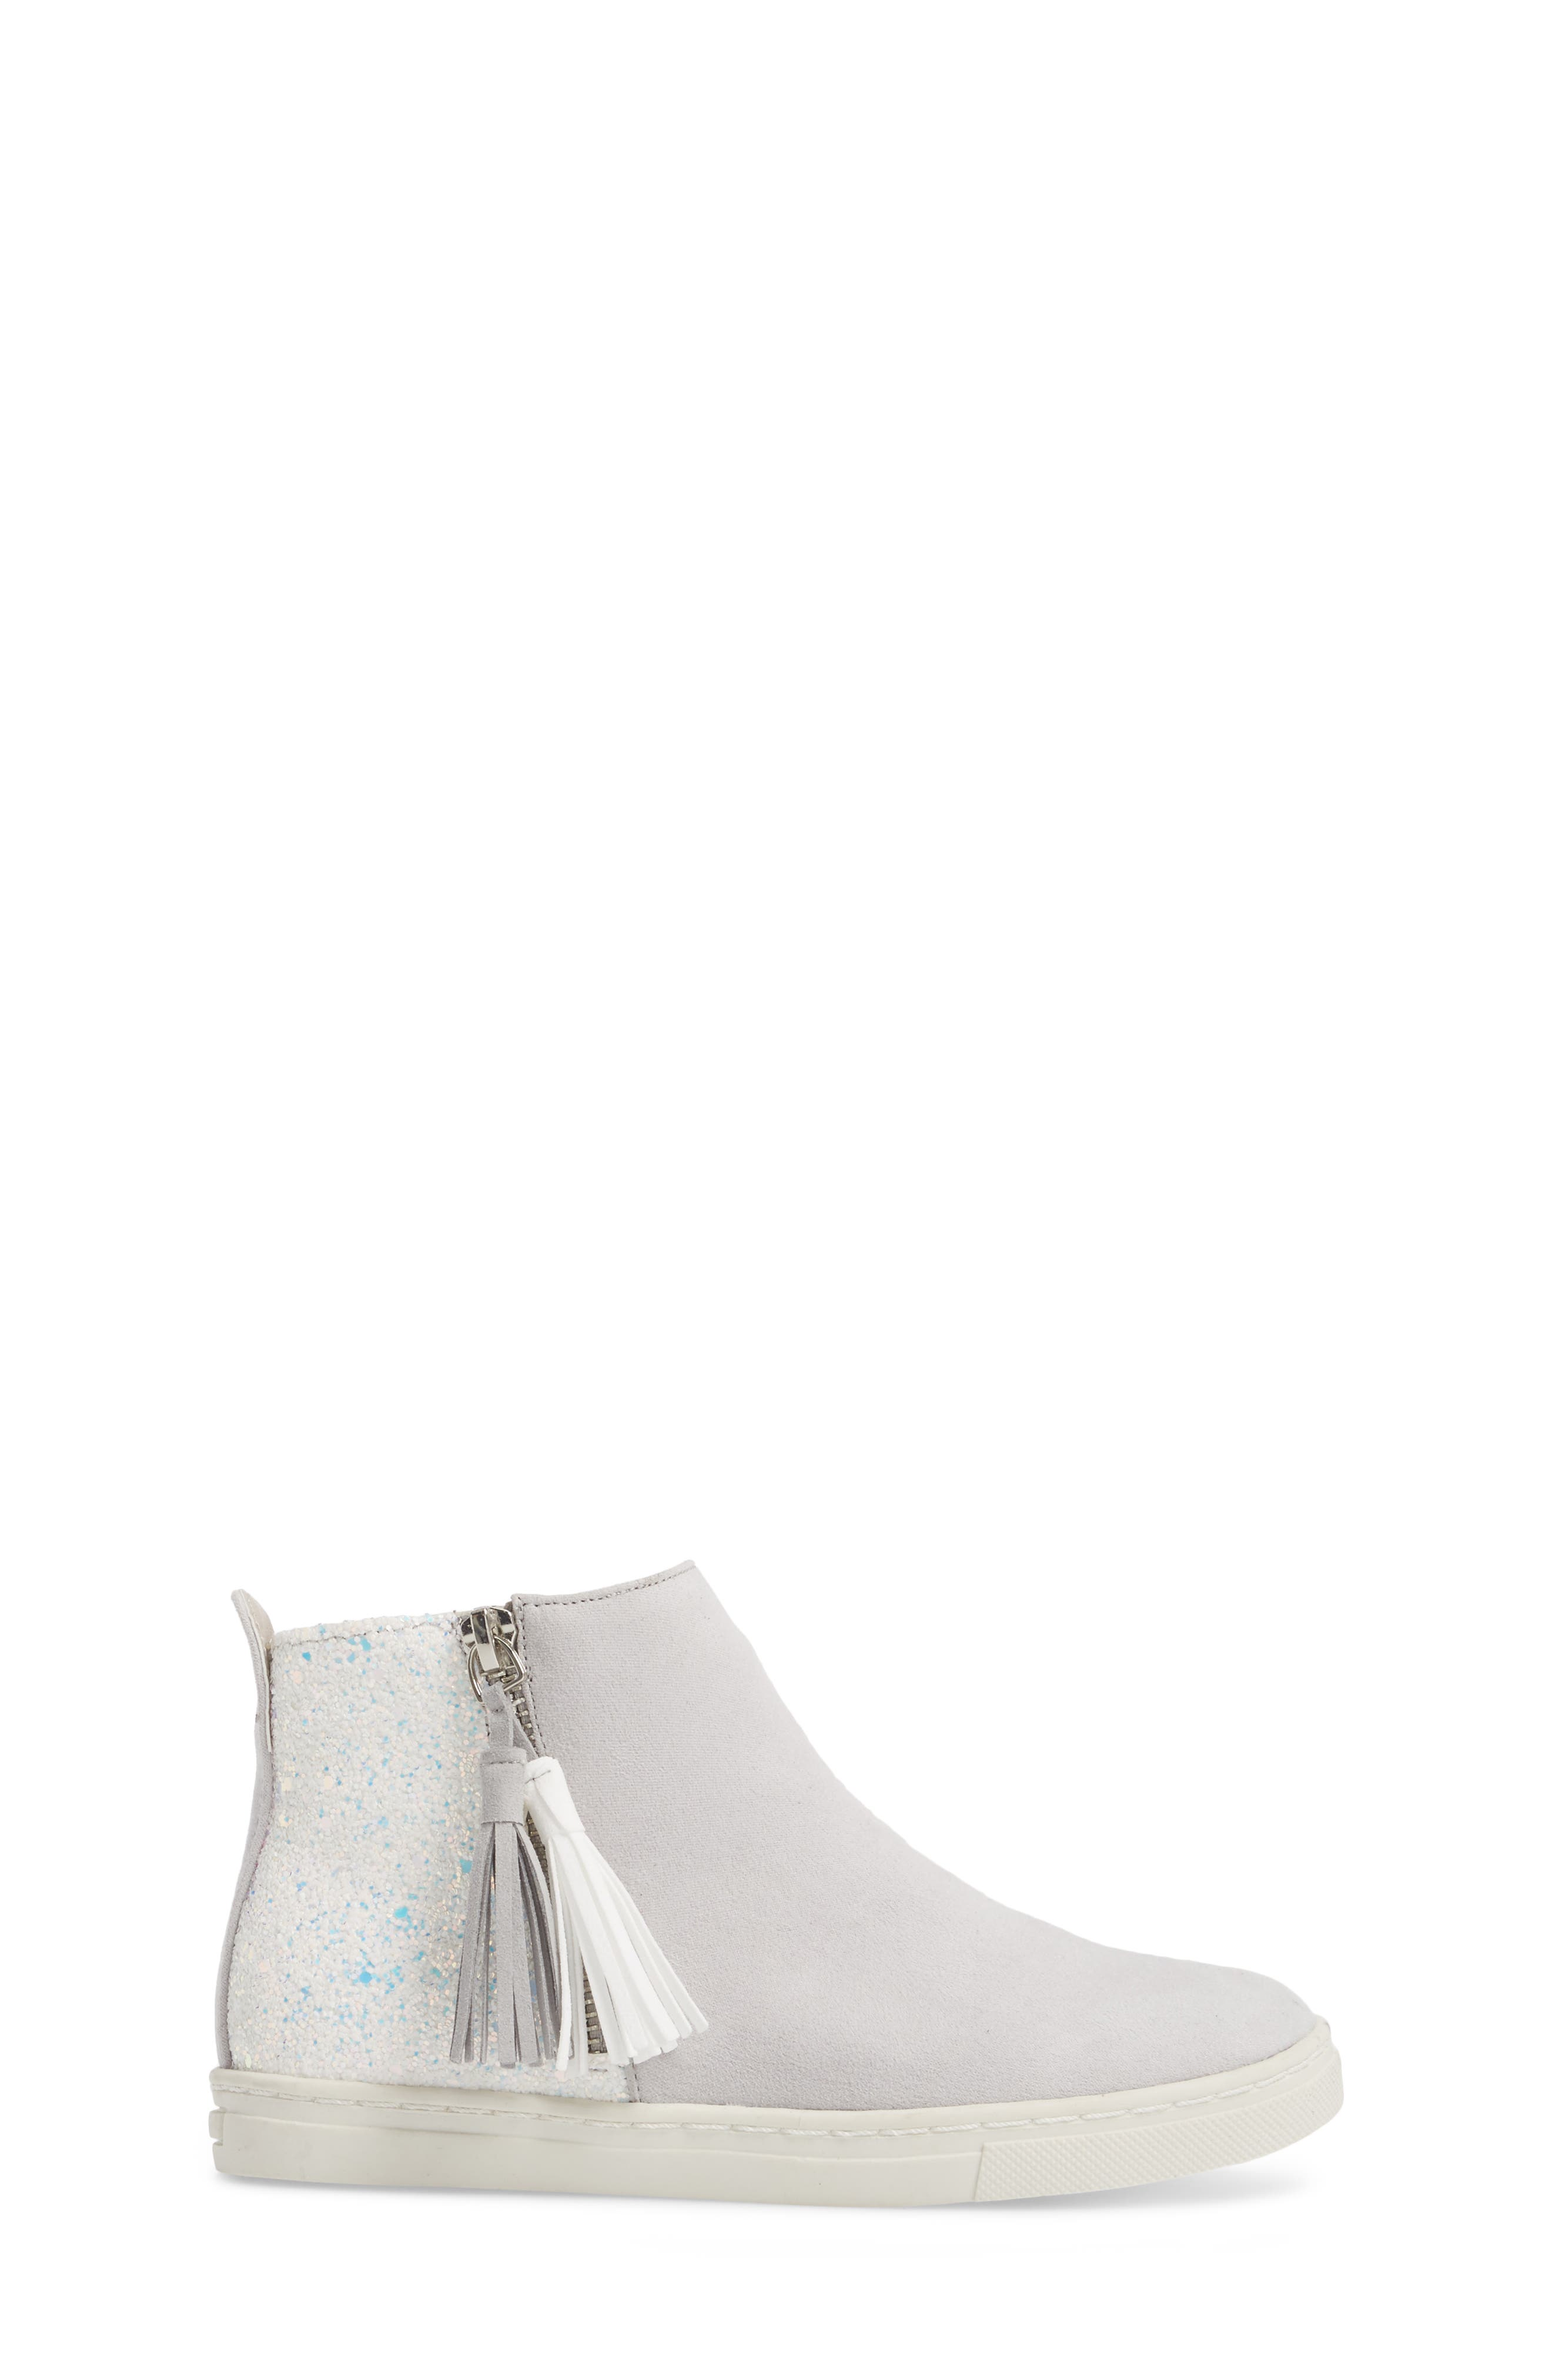 Zalix Glitter Sneaker,                             Alternate thumbnail 3, color,                             LIGHT GREY